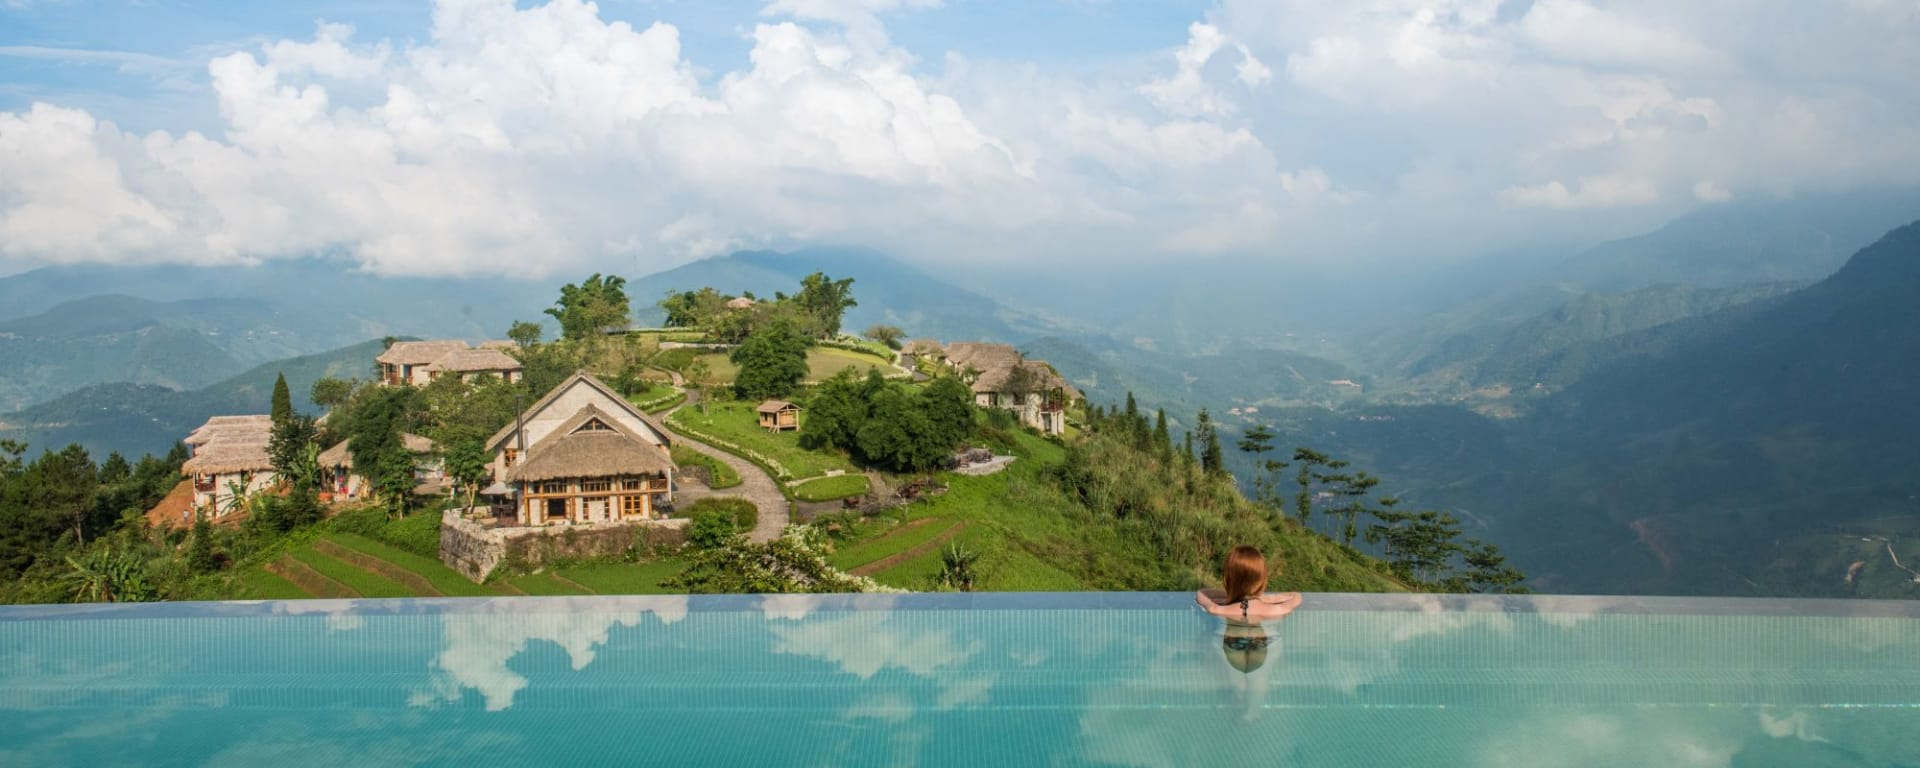 Abenteuer Sapa - Hiking Package ab Hanoi: Topas Ecolodge Pool